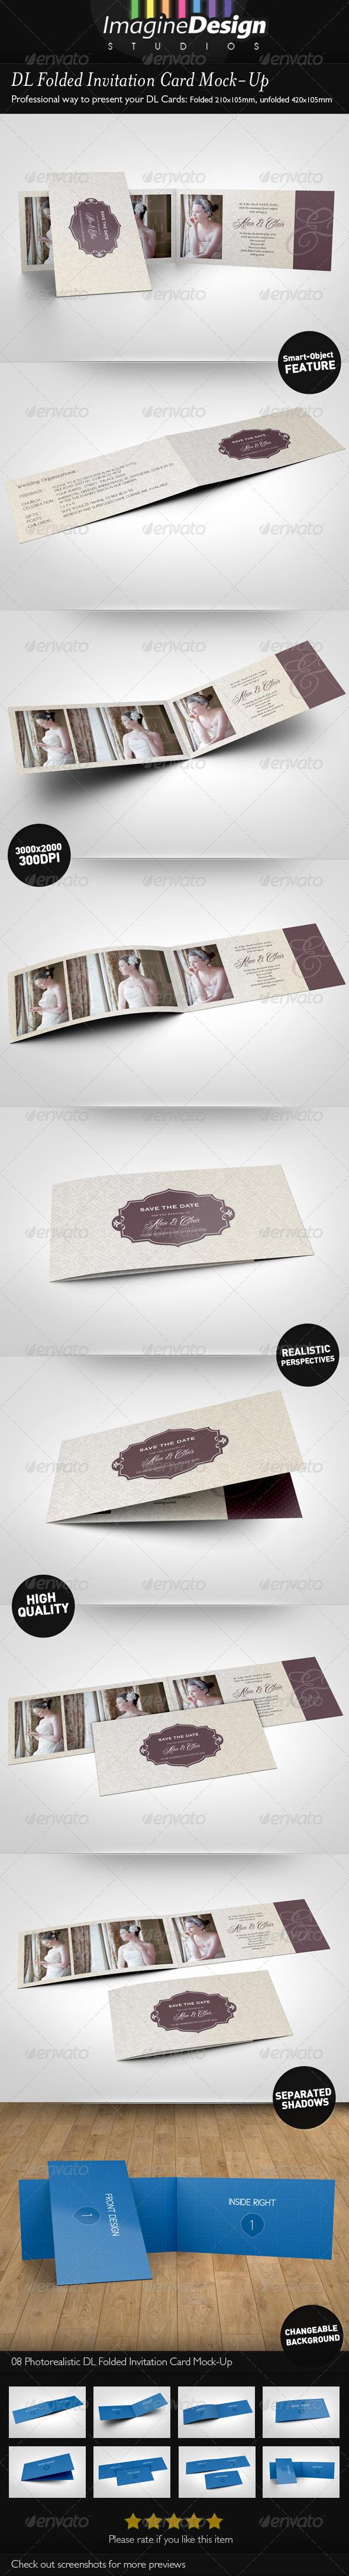 590 x 4350 · 611 kB · jpeg, DL Folded Invitation Card Mock-Up ...